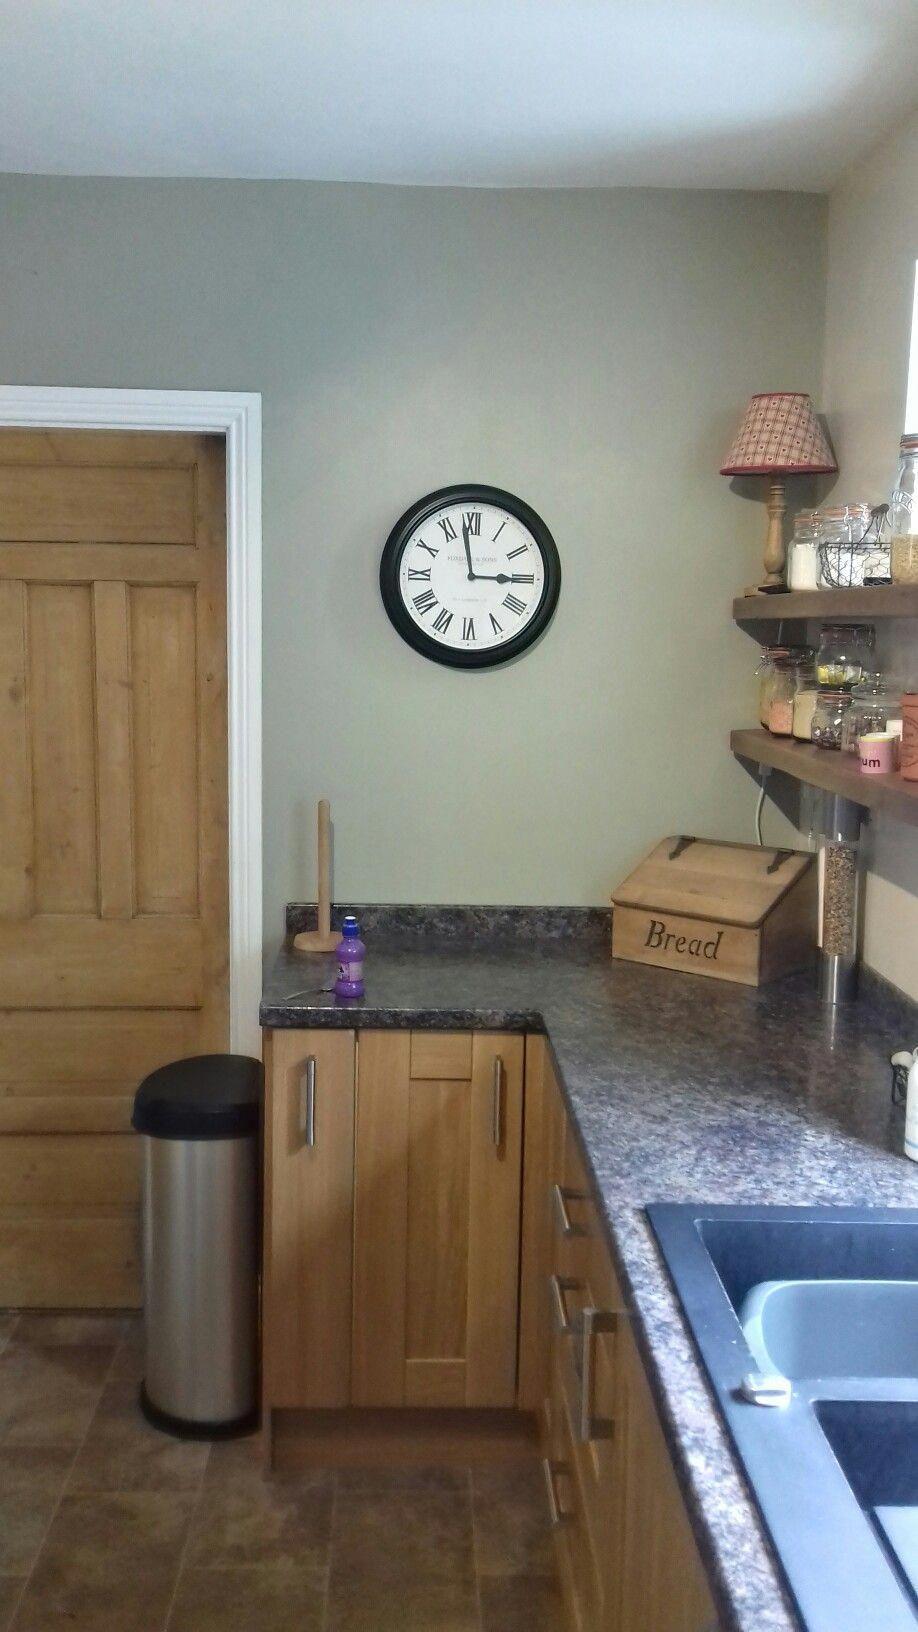 Dulux Overtly Olive Kitchencolourolive Paint For Kitchen Walls Green Kitchen Walls Olive Kitchen